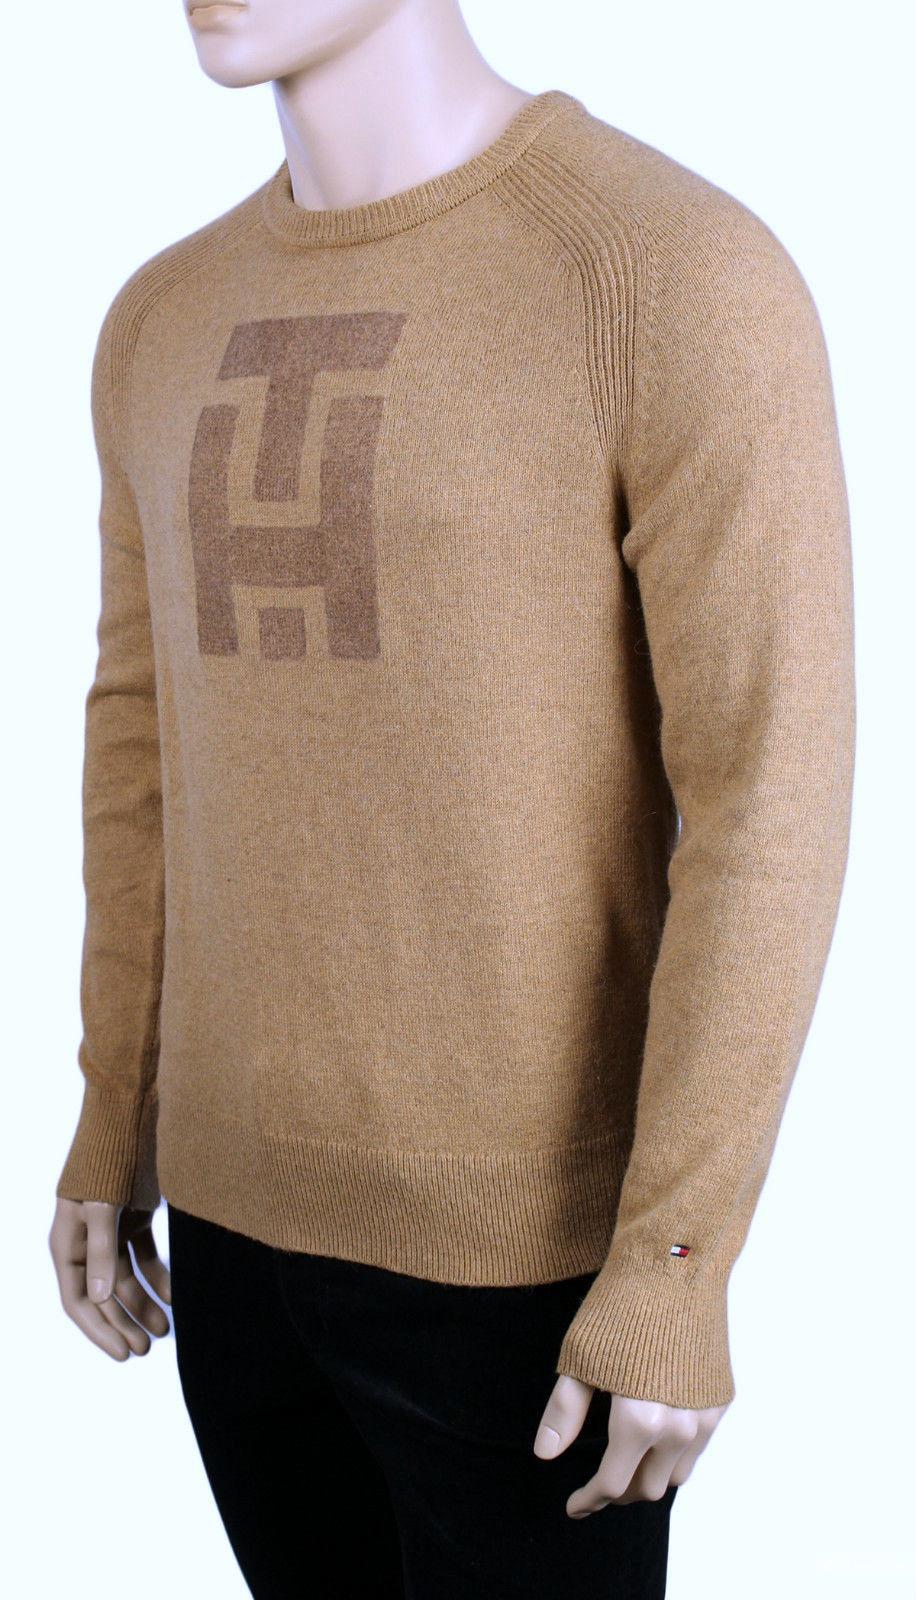 Мужской вязаный свитер Tommy Hilfiger L (50-52р)